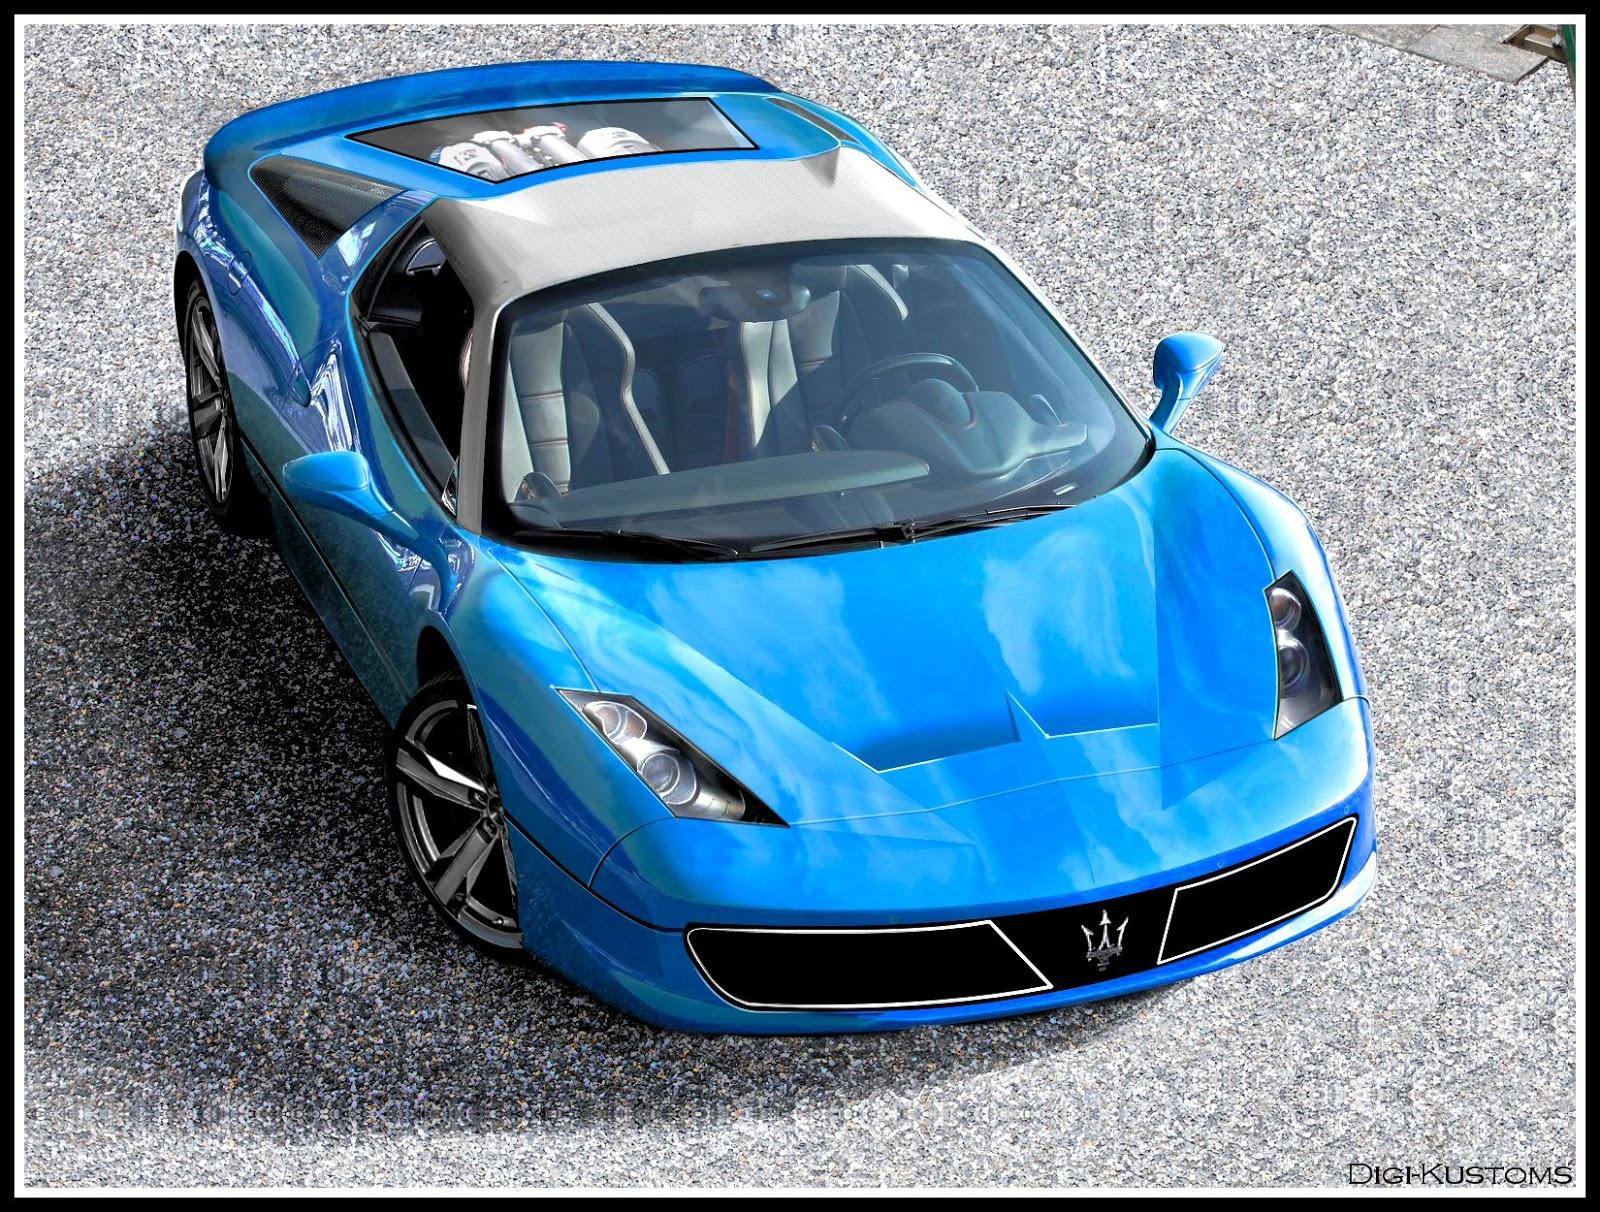 Digi-Kustoms: Maserati Bora 2013 concept